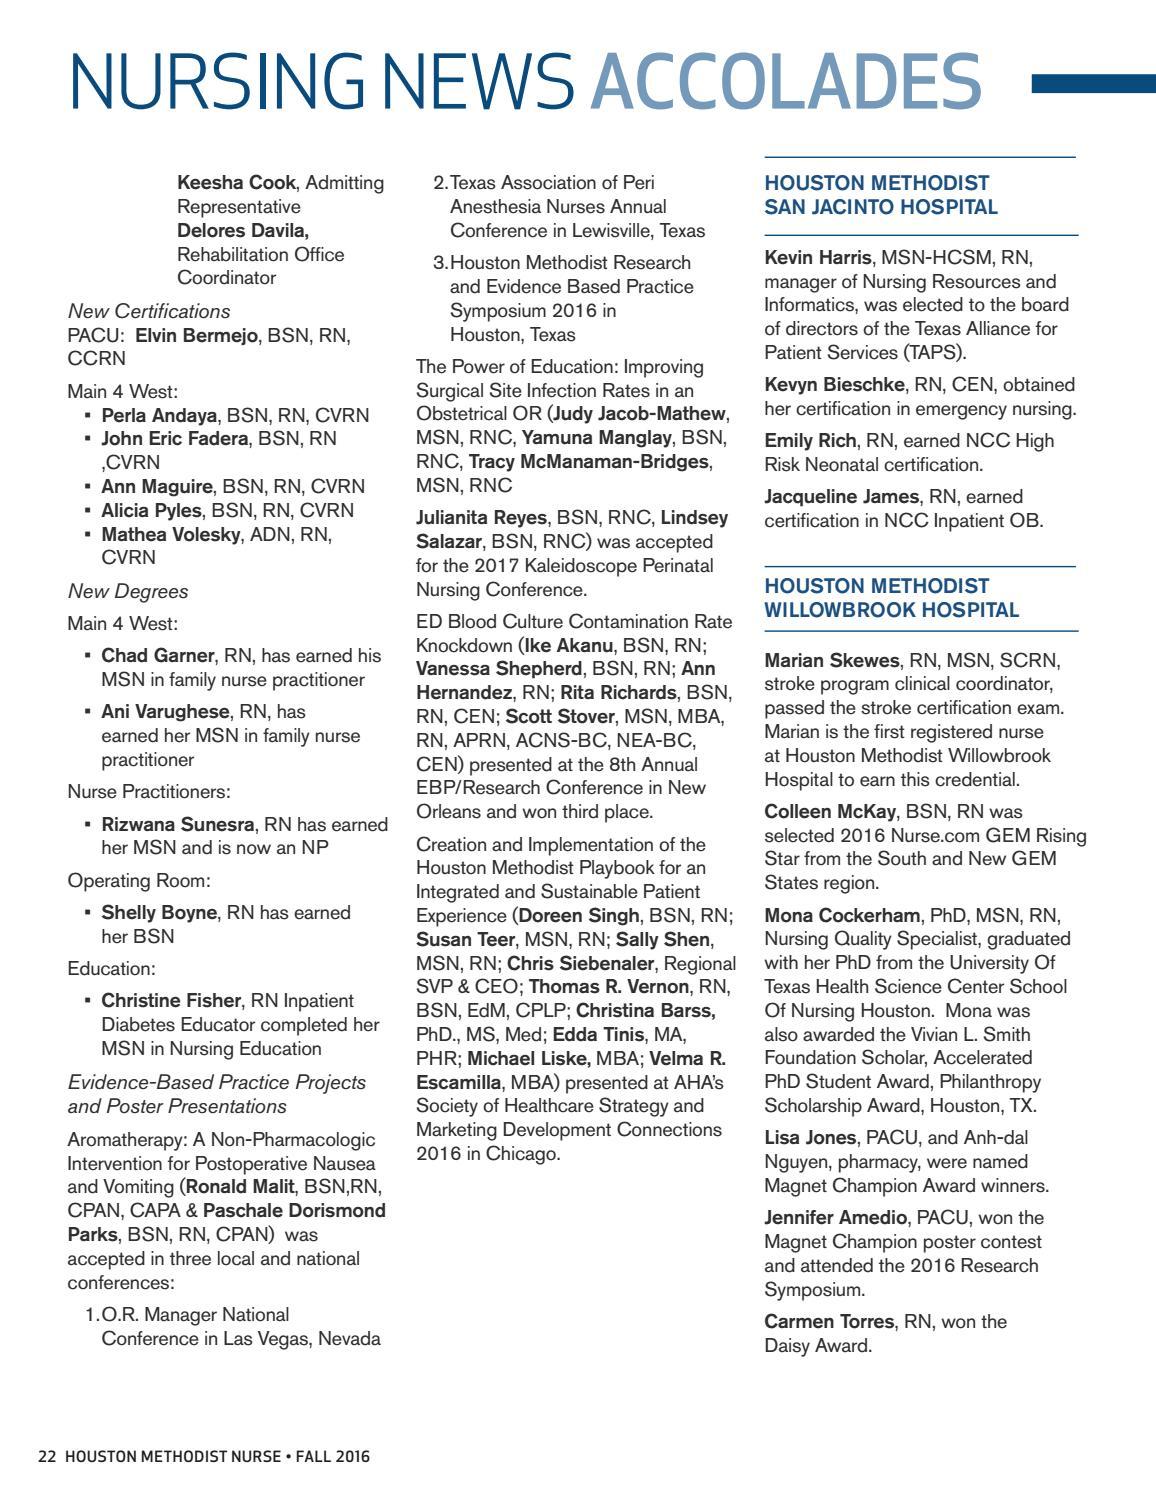 Houston Methodist Nursing Magazine Fall 2016 By Houston Methodist